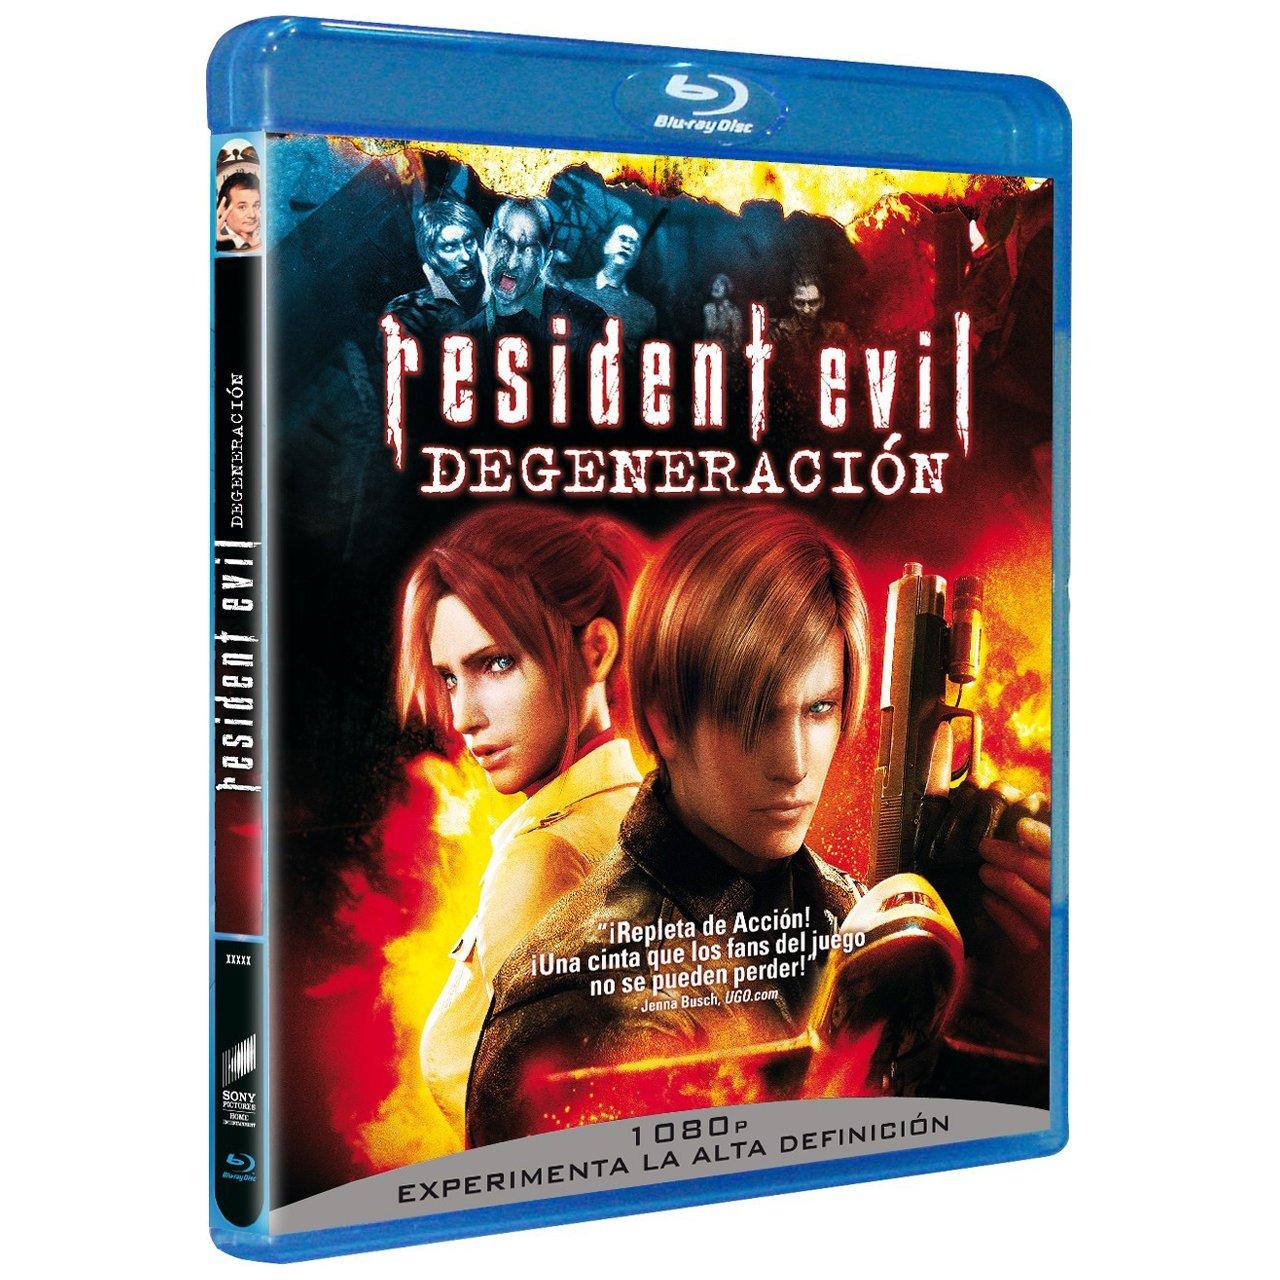 Resident Evil:Degeneracion - Bd [Blu-ray]: Amazon.es: Varios ...